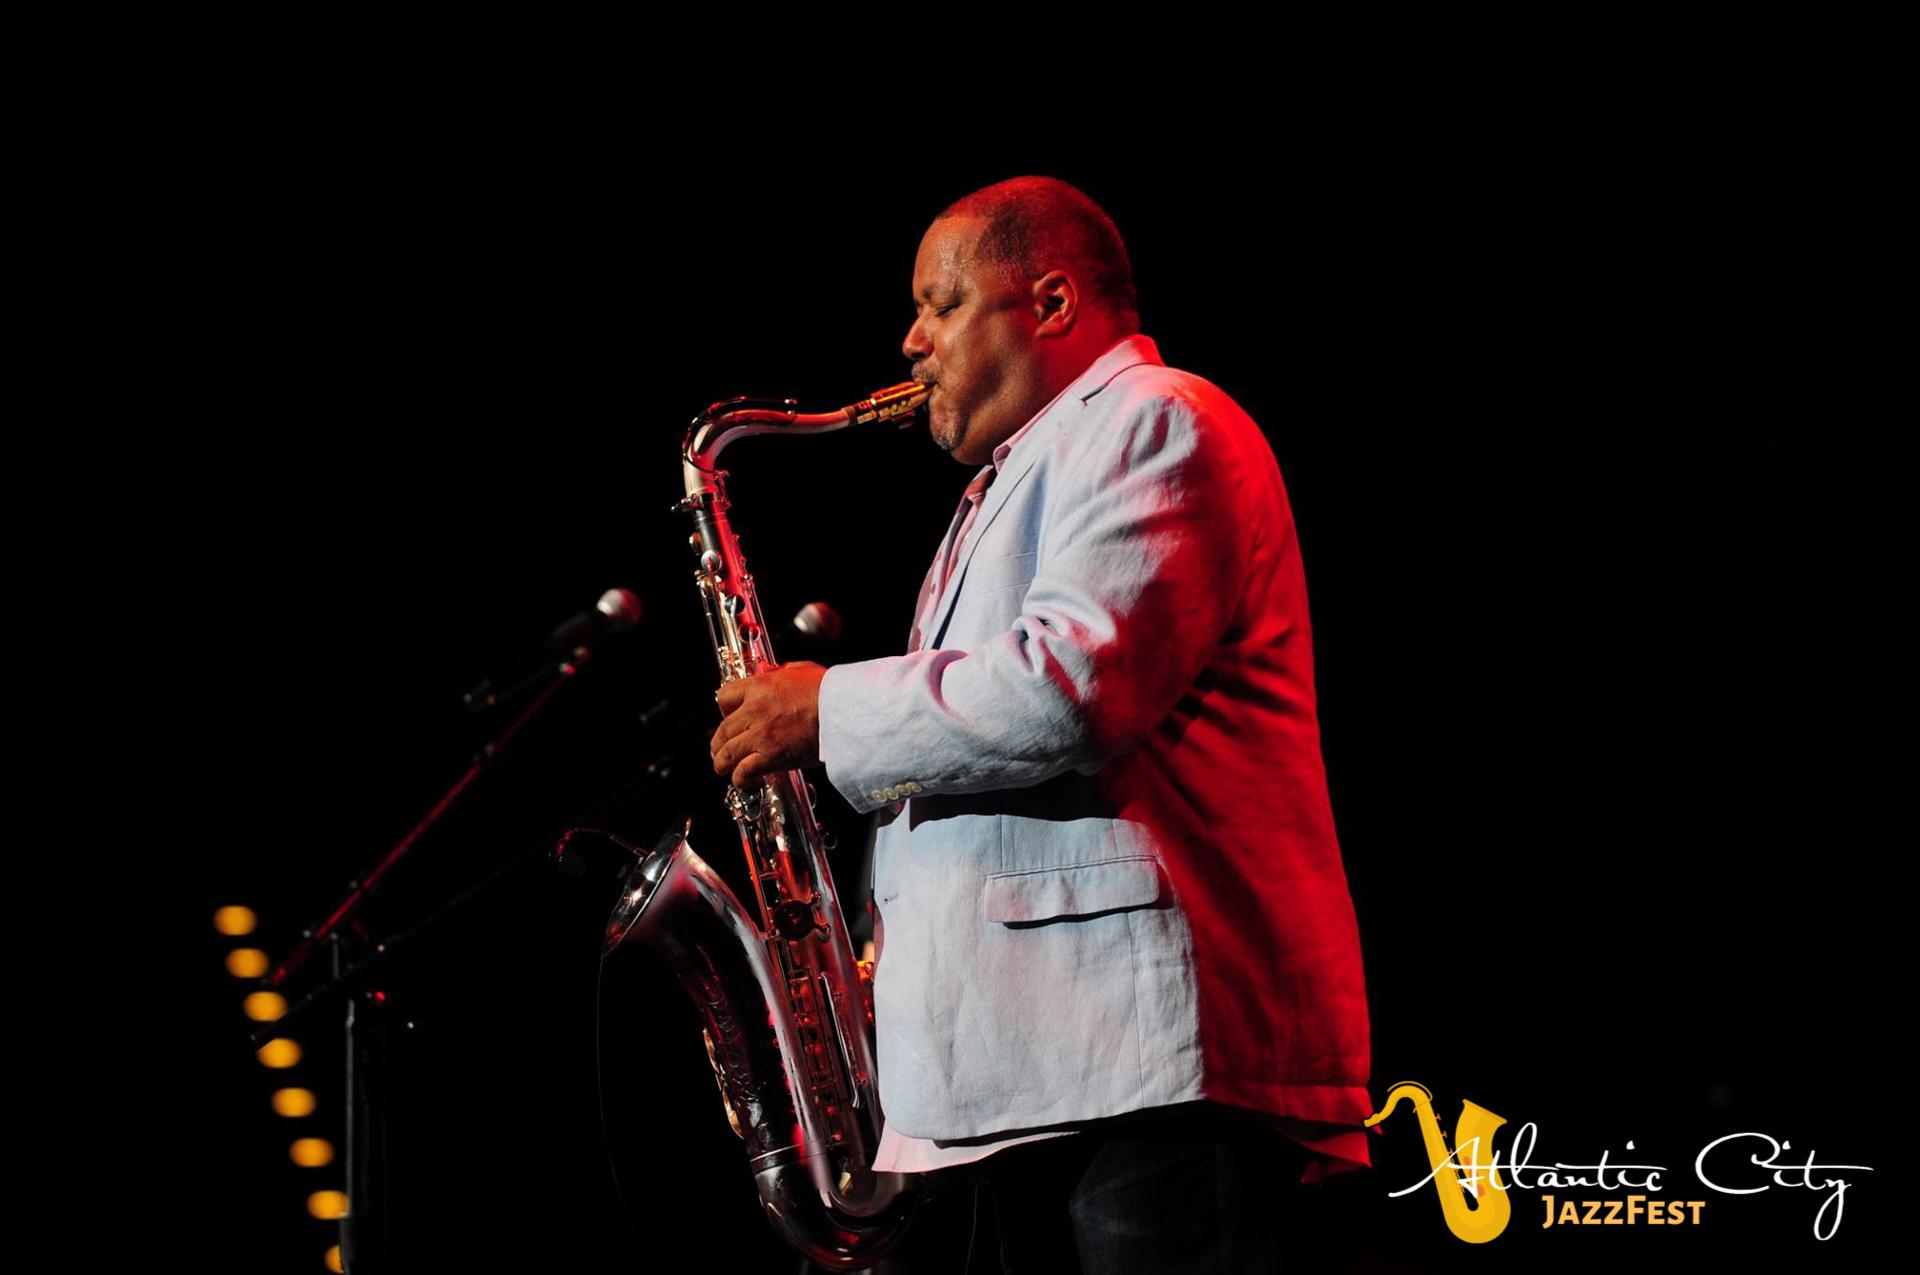 2019 Jazz Fest Picture-59